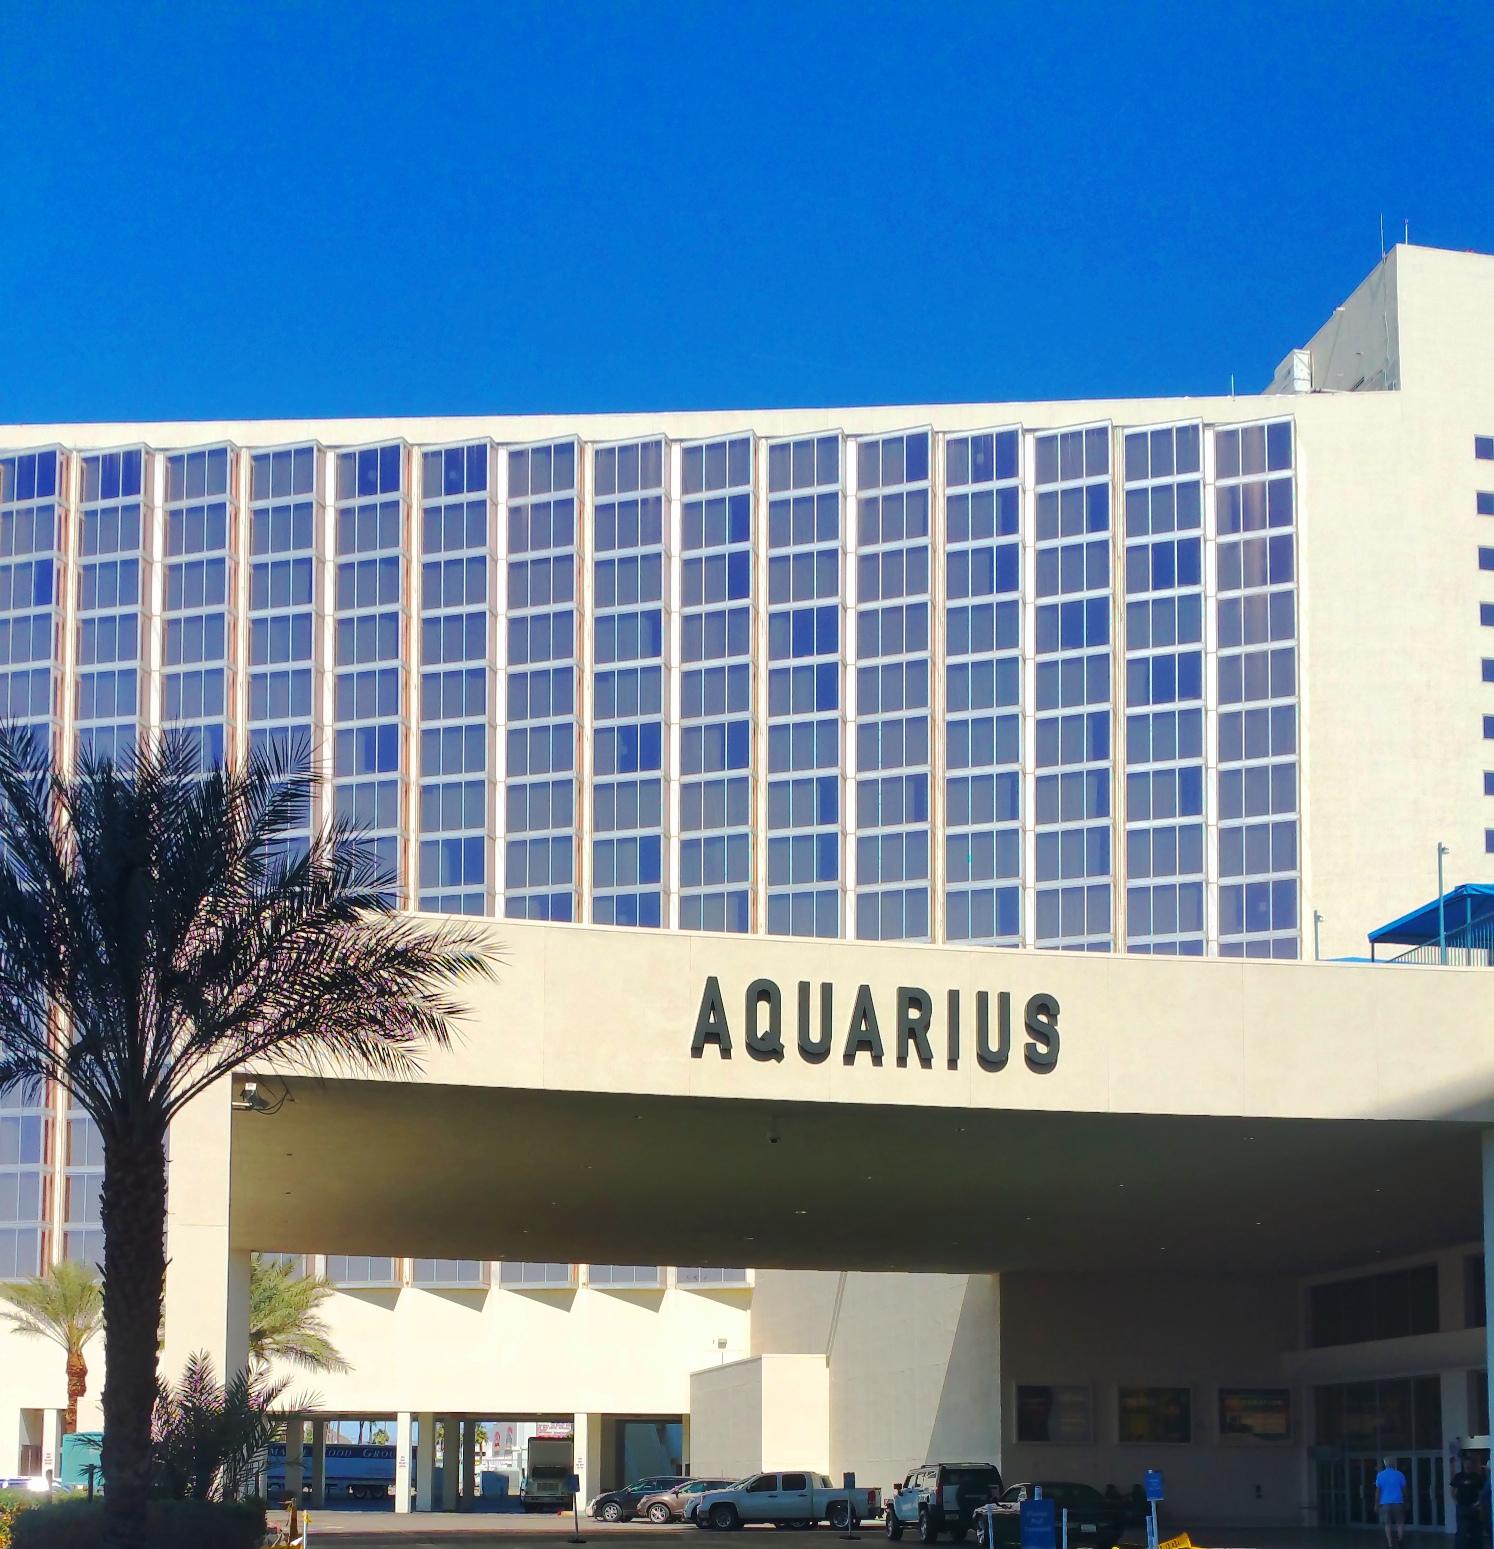 Laughlin Buzz Aquarius Resort Wins More Quot Best Of Quot Awards